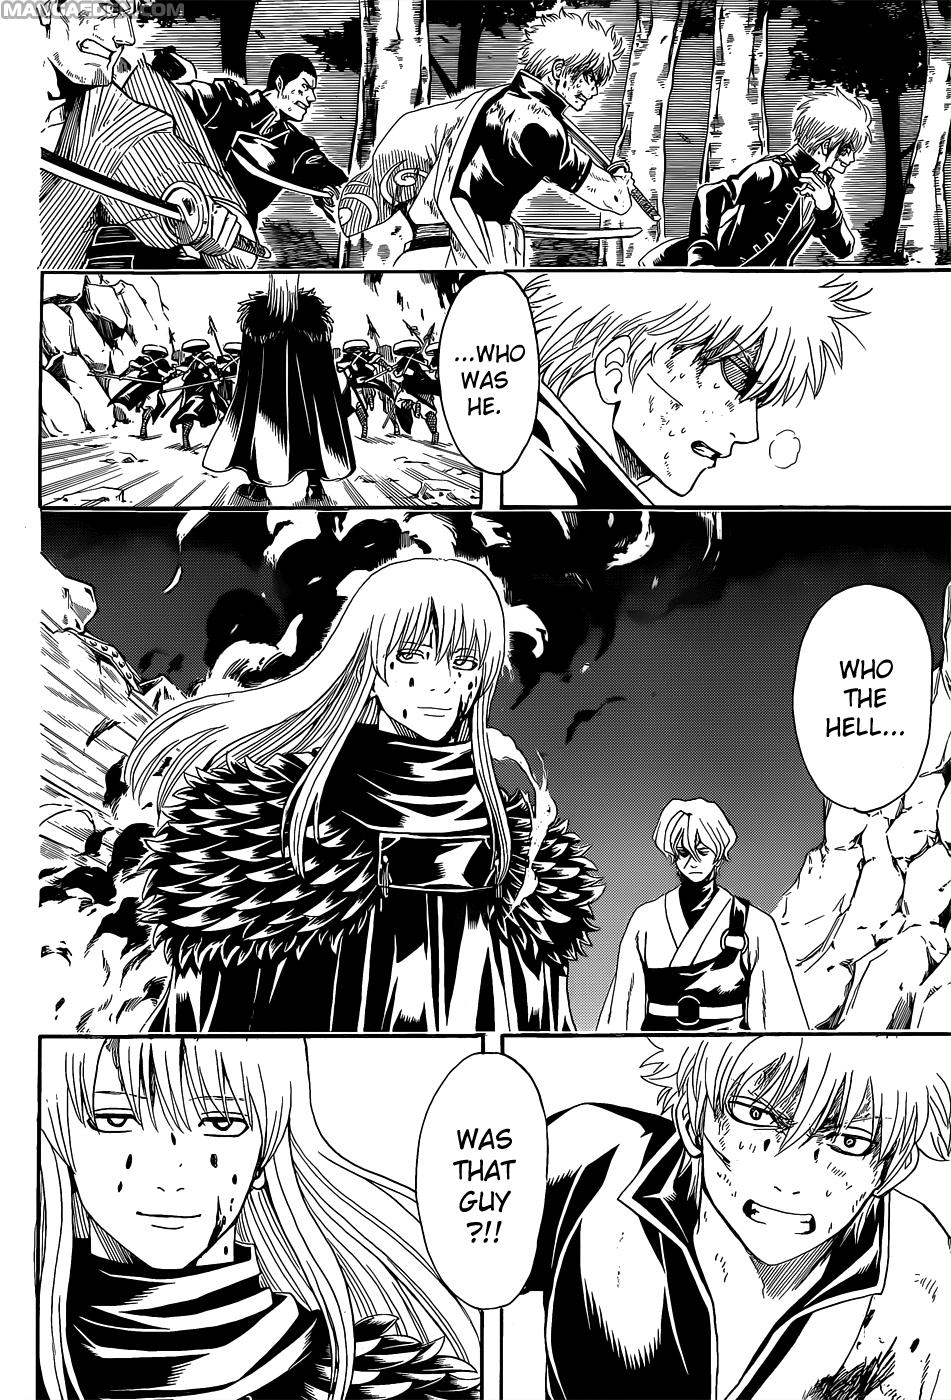 Manga Gintama Chapter 545 Page 9 Gintamamy